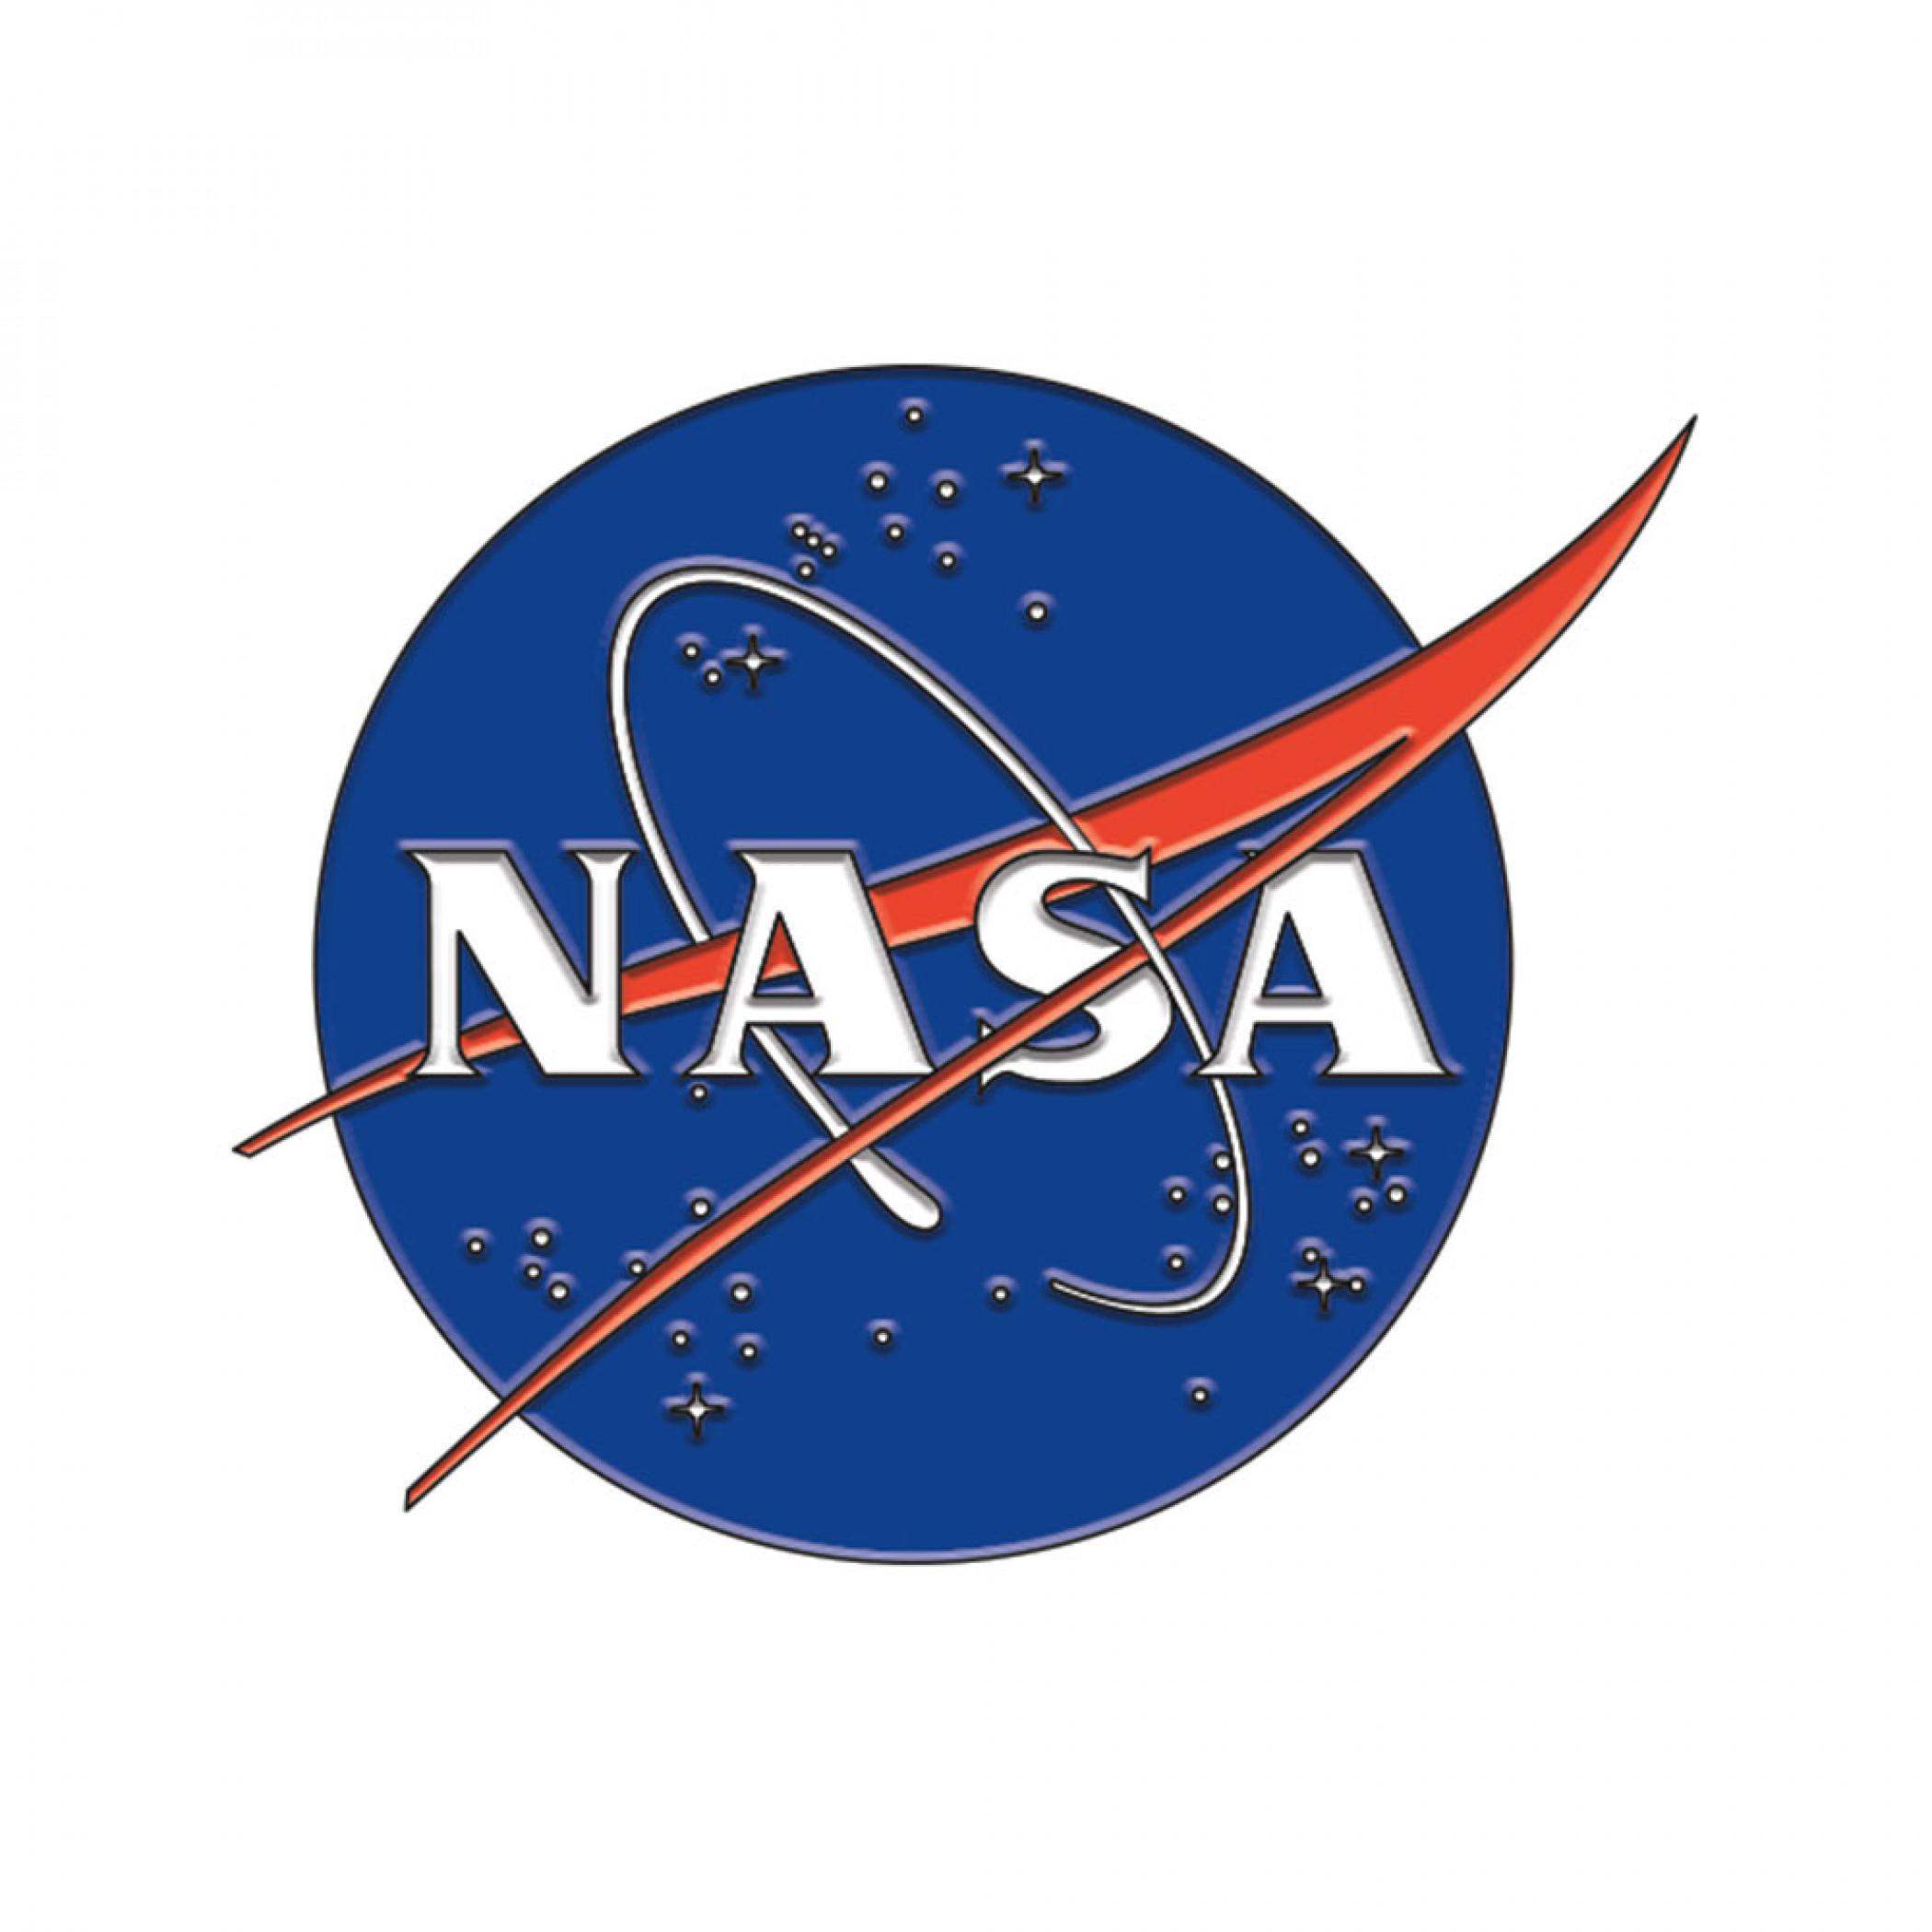 NASA Enamel Pin